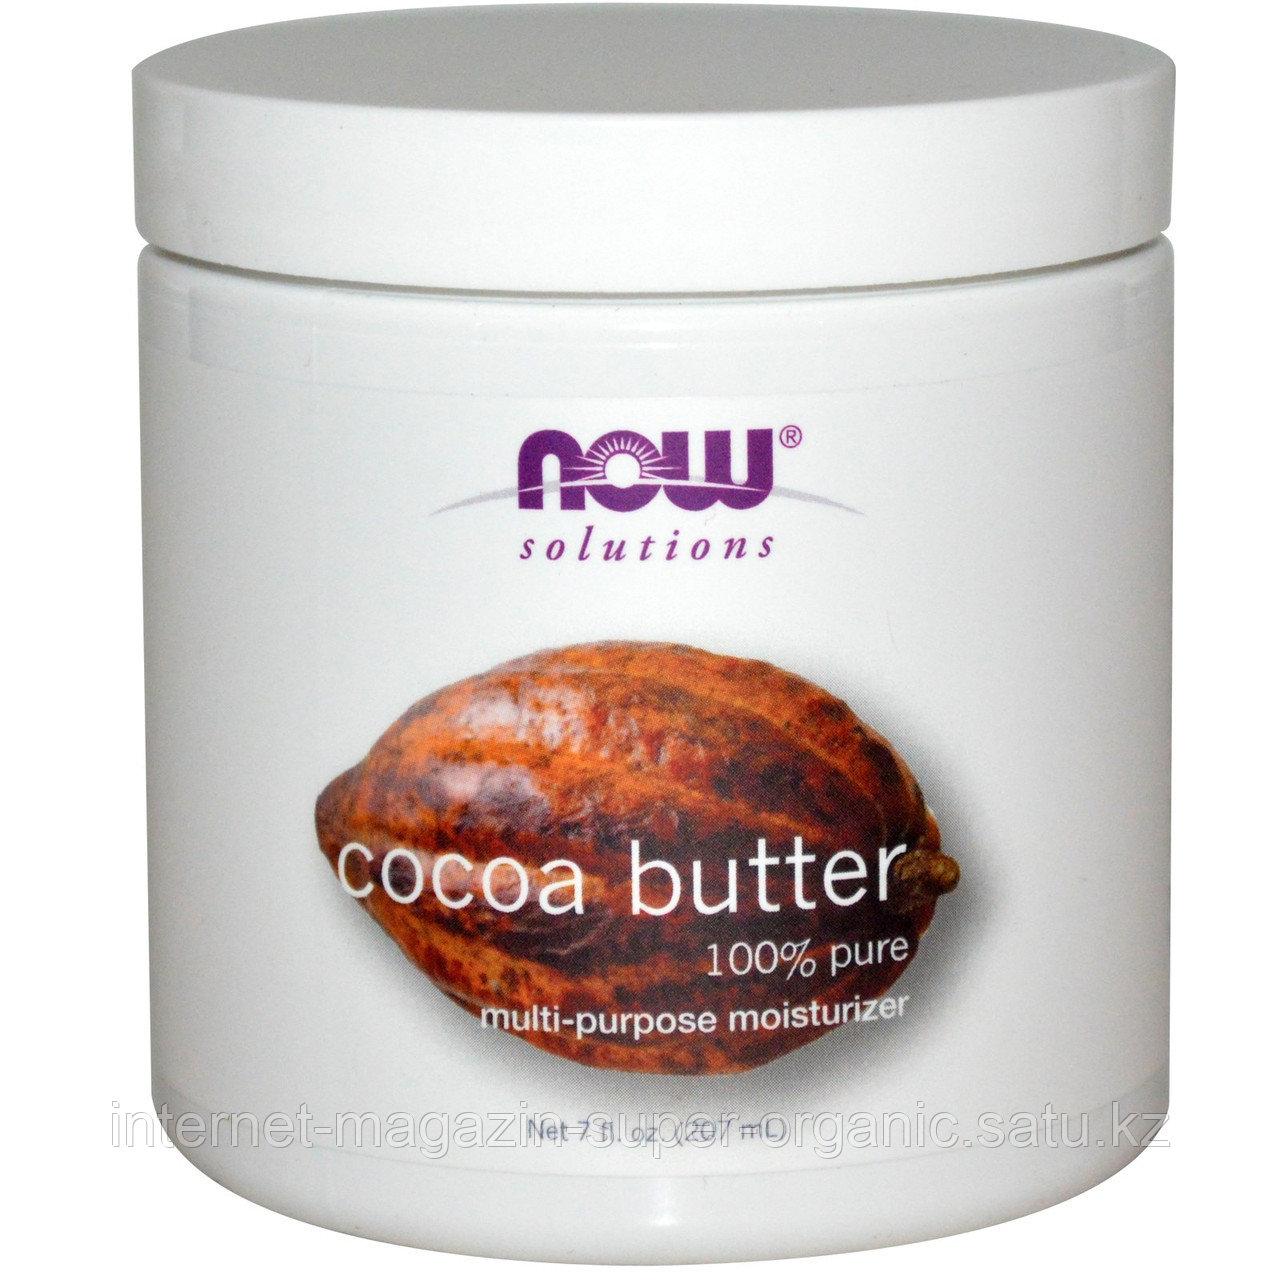 Масло какао (Solutions), 7 жидких унций (207 мл), Now Foods